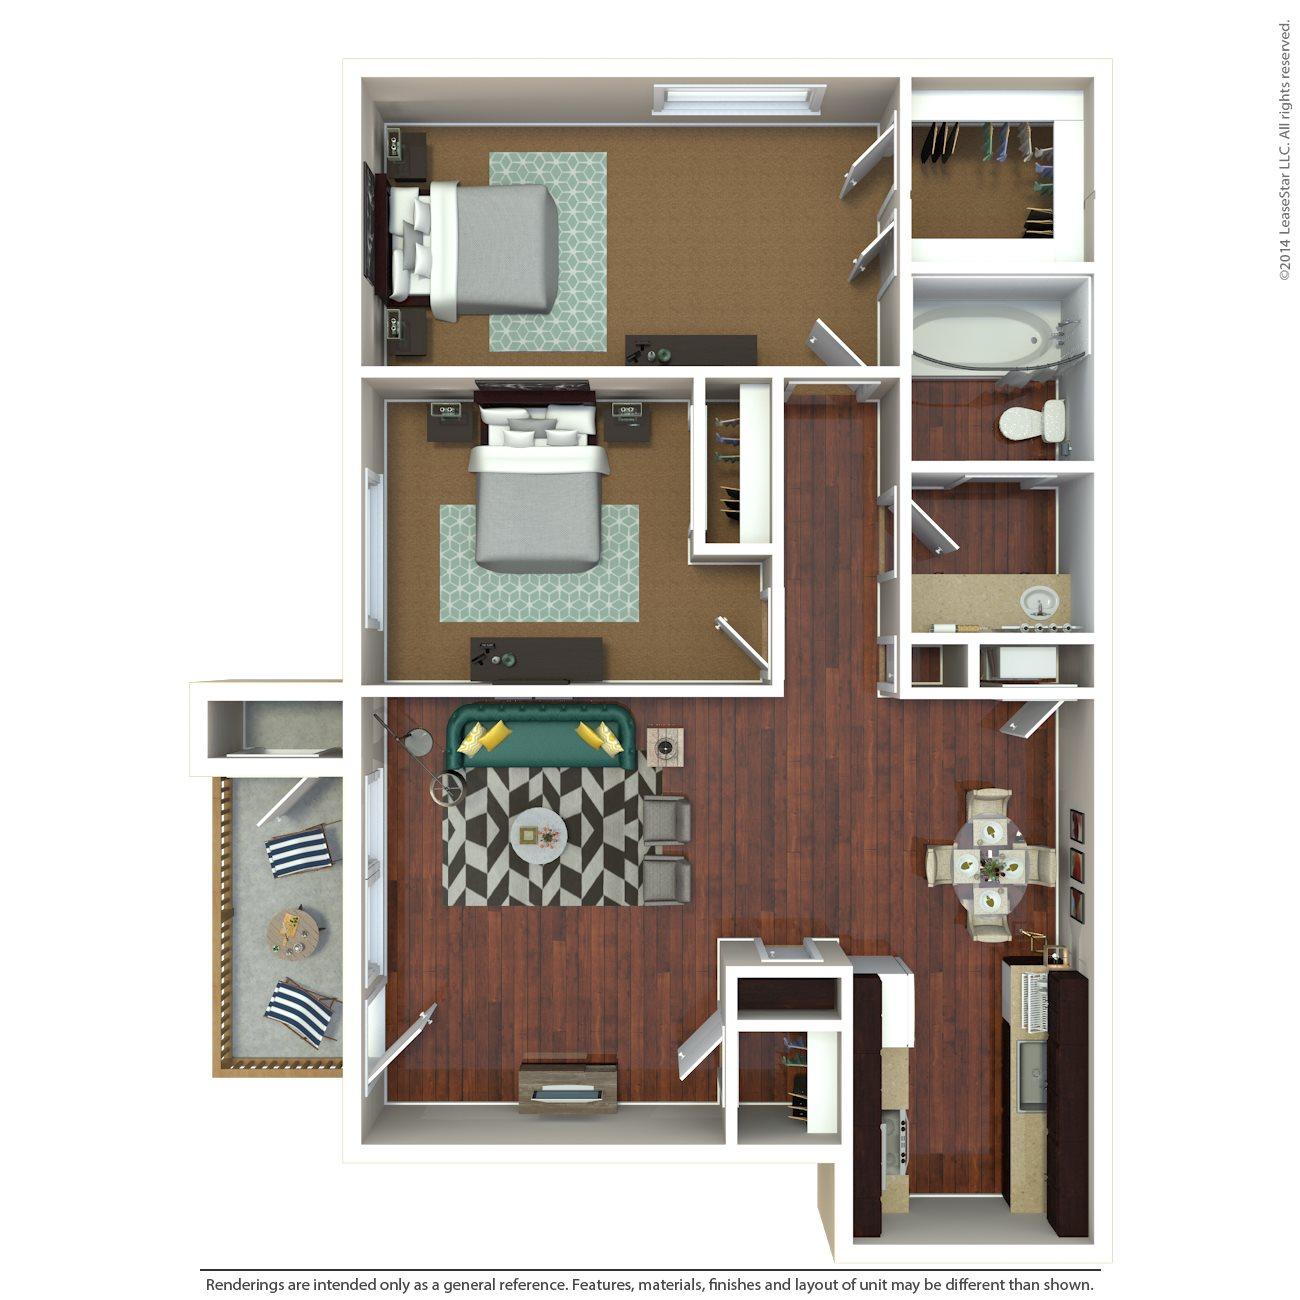 Hidden Lake Apartments San Antonio: Breckenridge Village Apartments In Sacramento, California